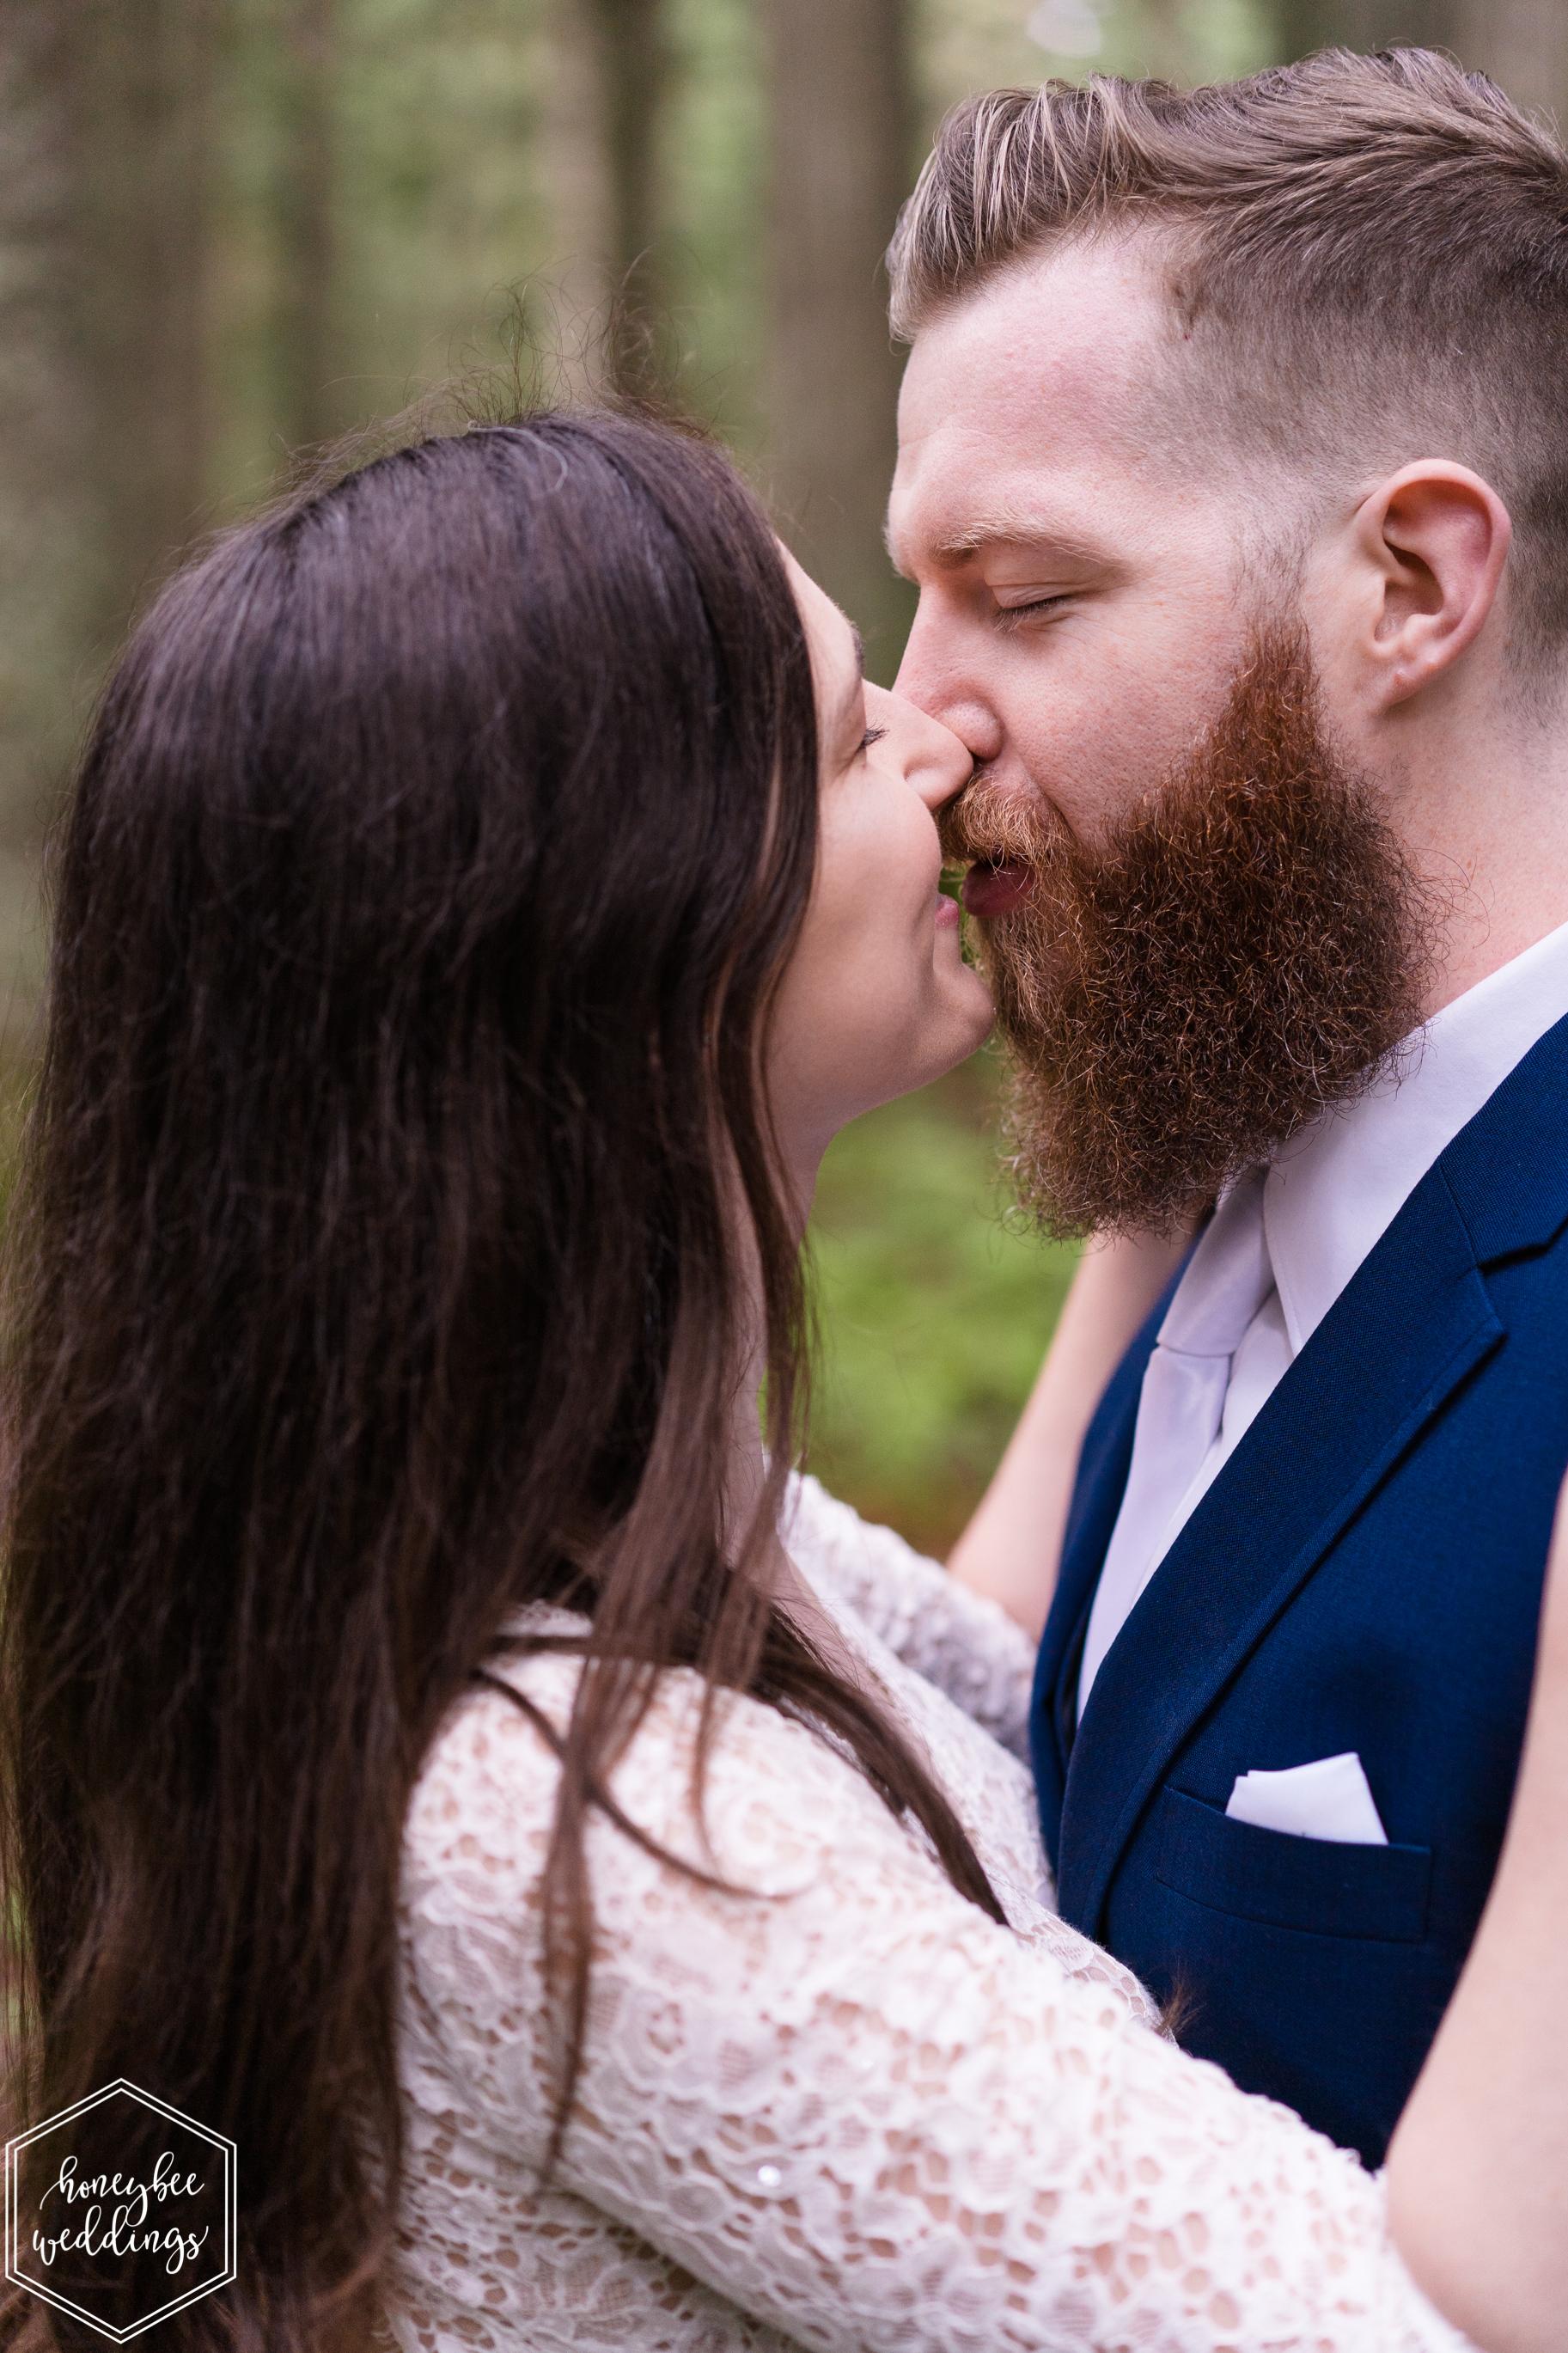 323Glacier National Park Wedding_Izaak Walton Inn Wedding_Honeybee Weddings_Norah & Kyle_June 09, 2019-212.jpg